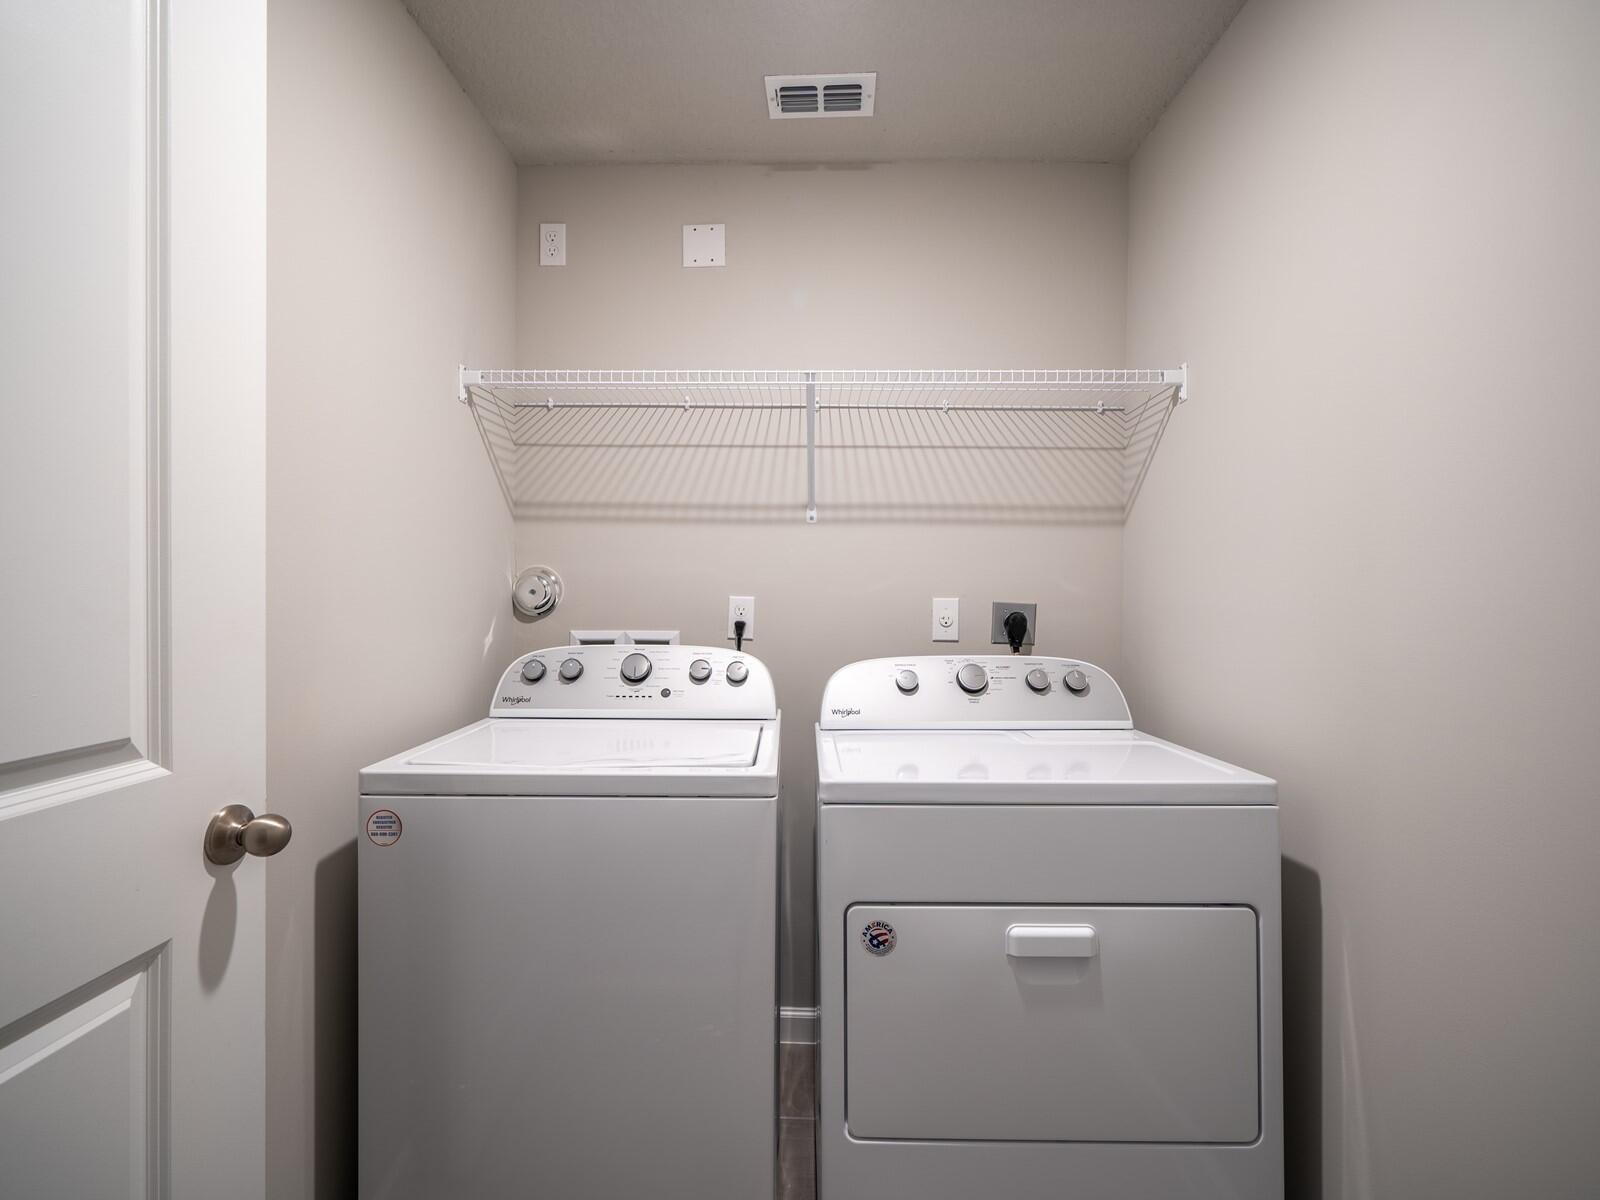 015_Laundry